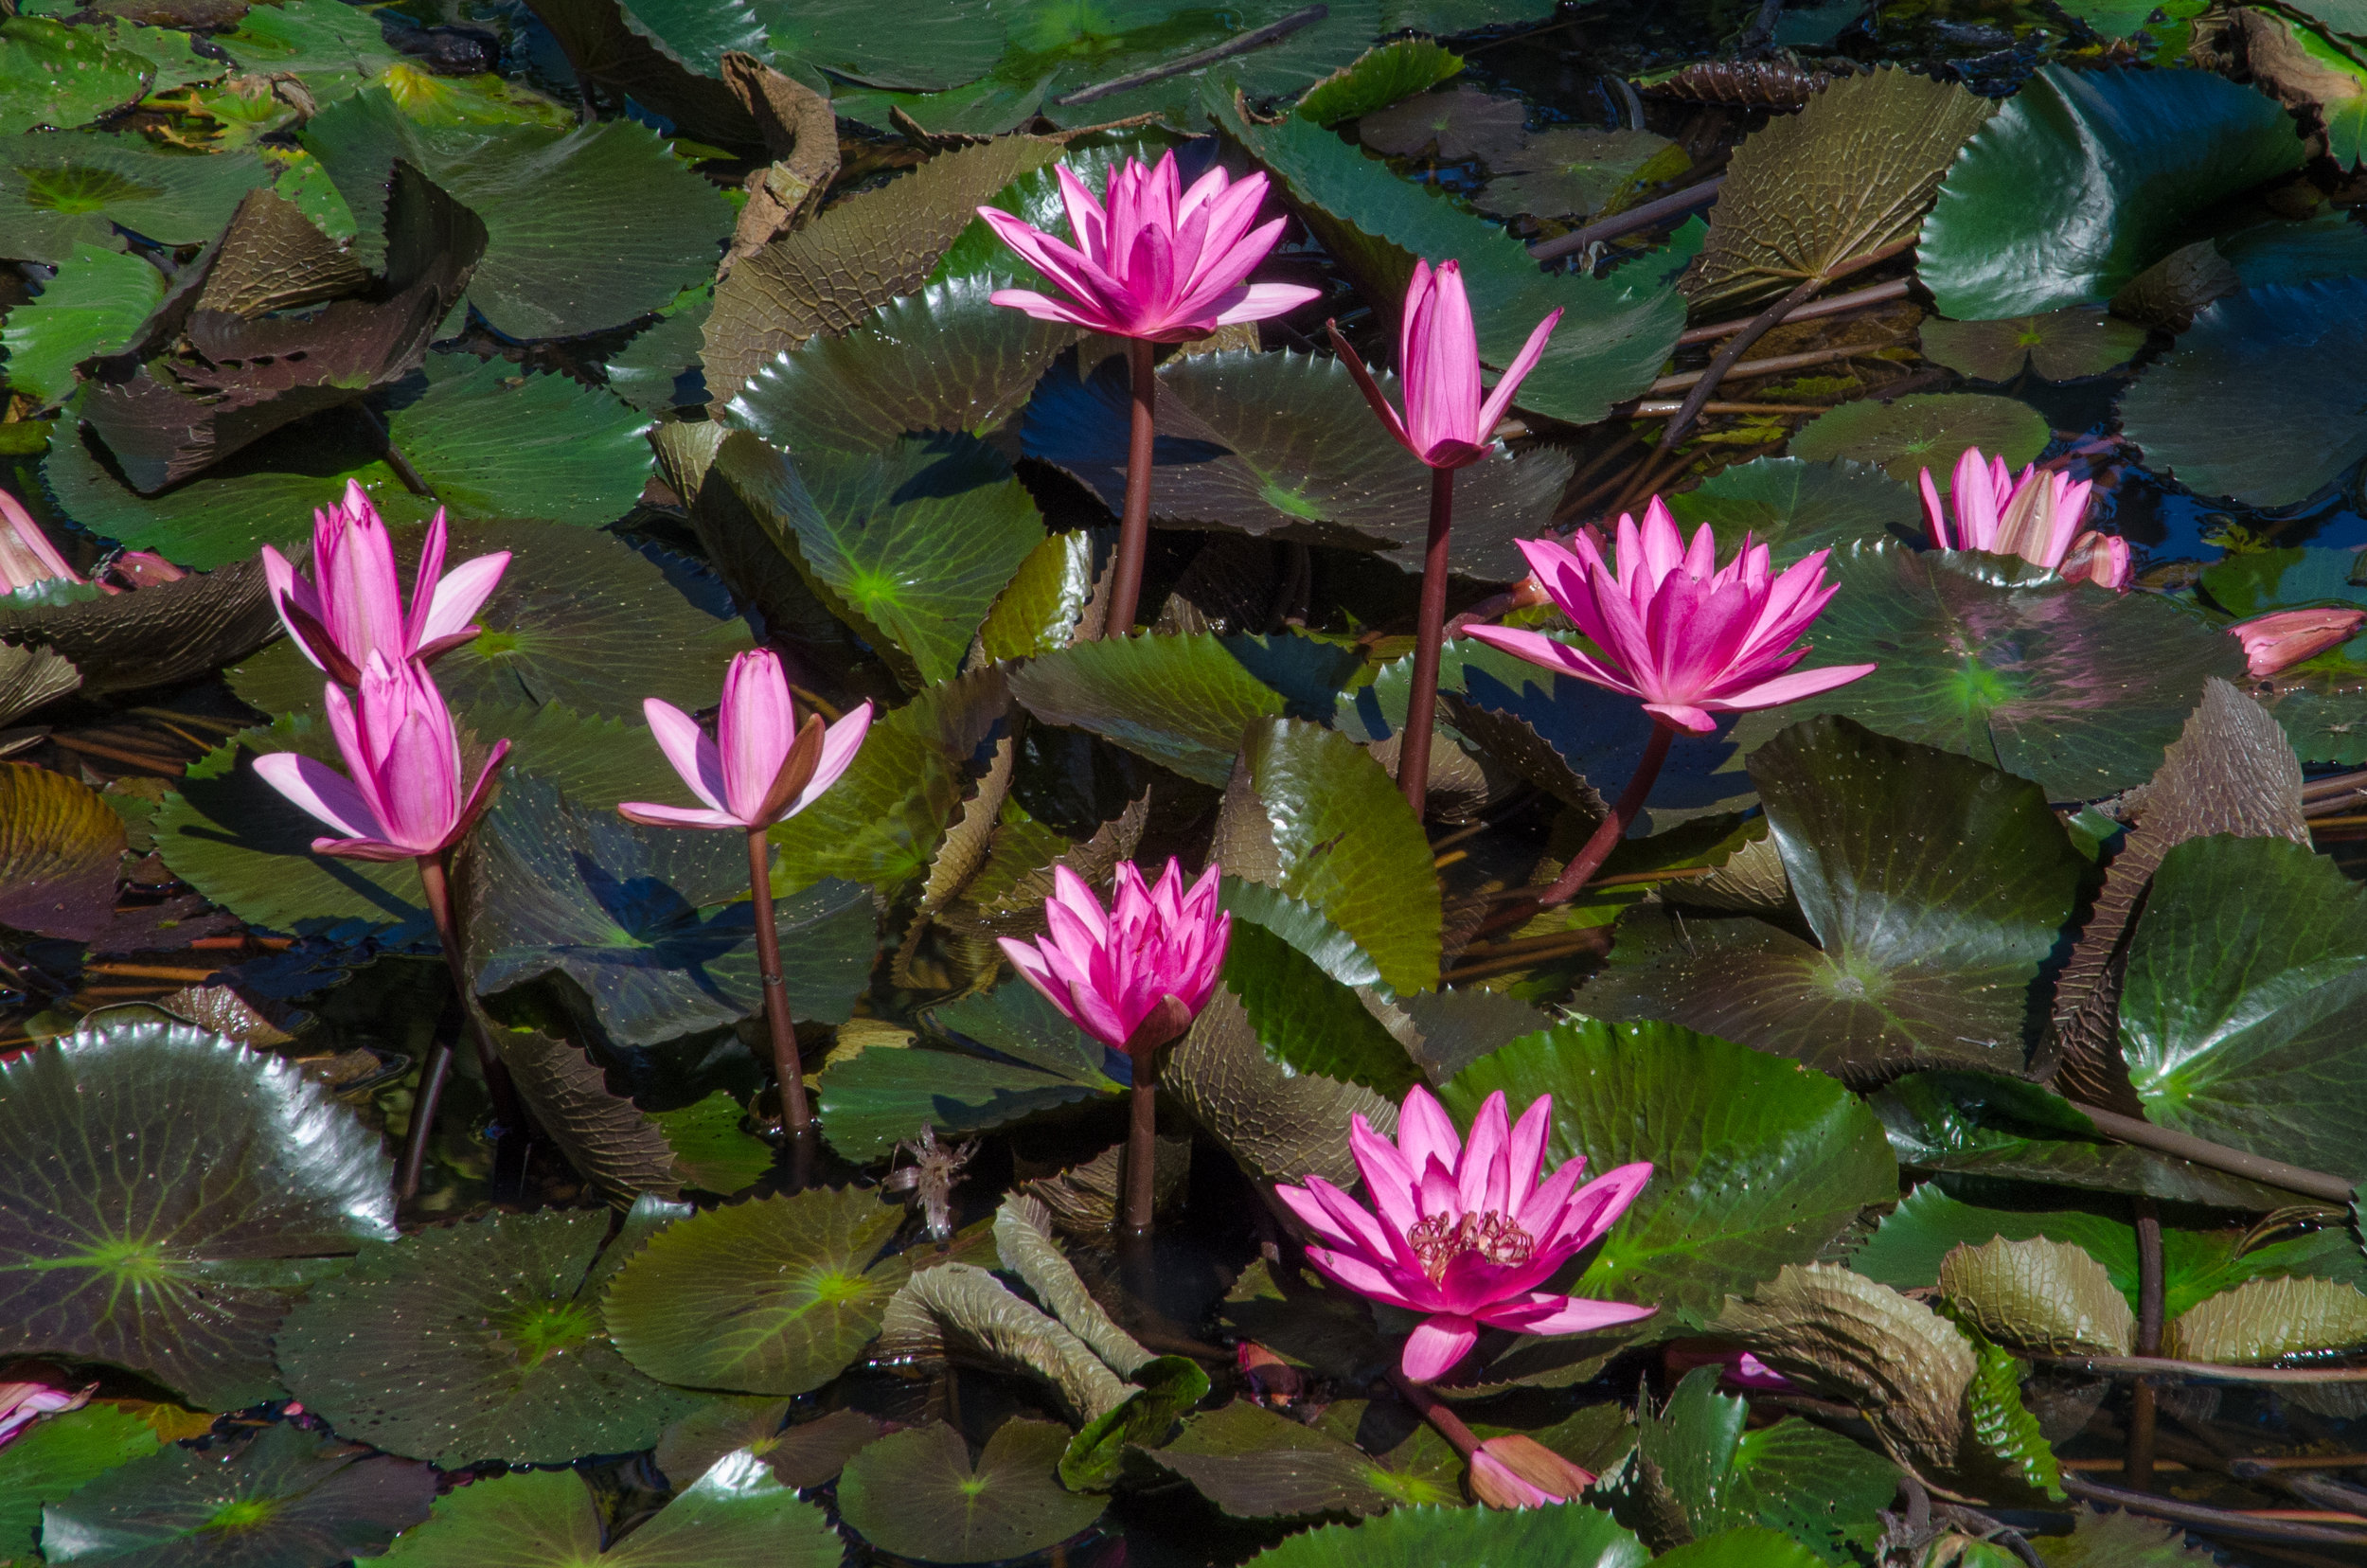 Lotus flowers, National Museum complex, Luang Prabang, Laos